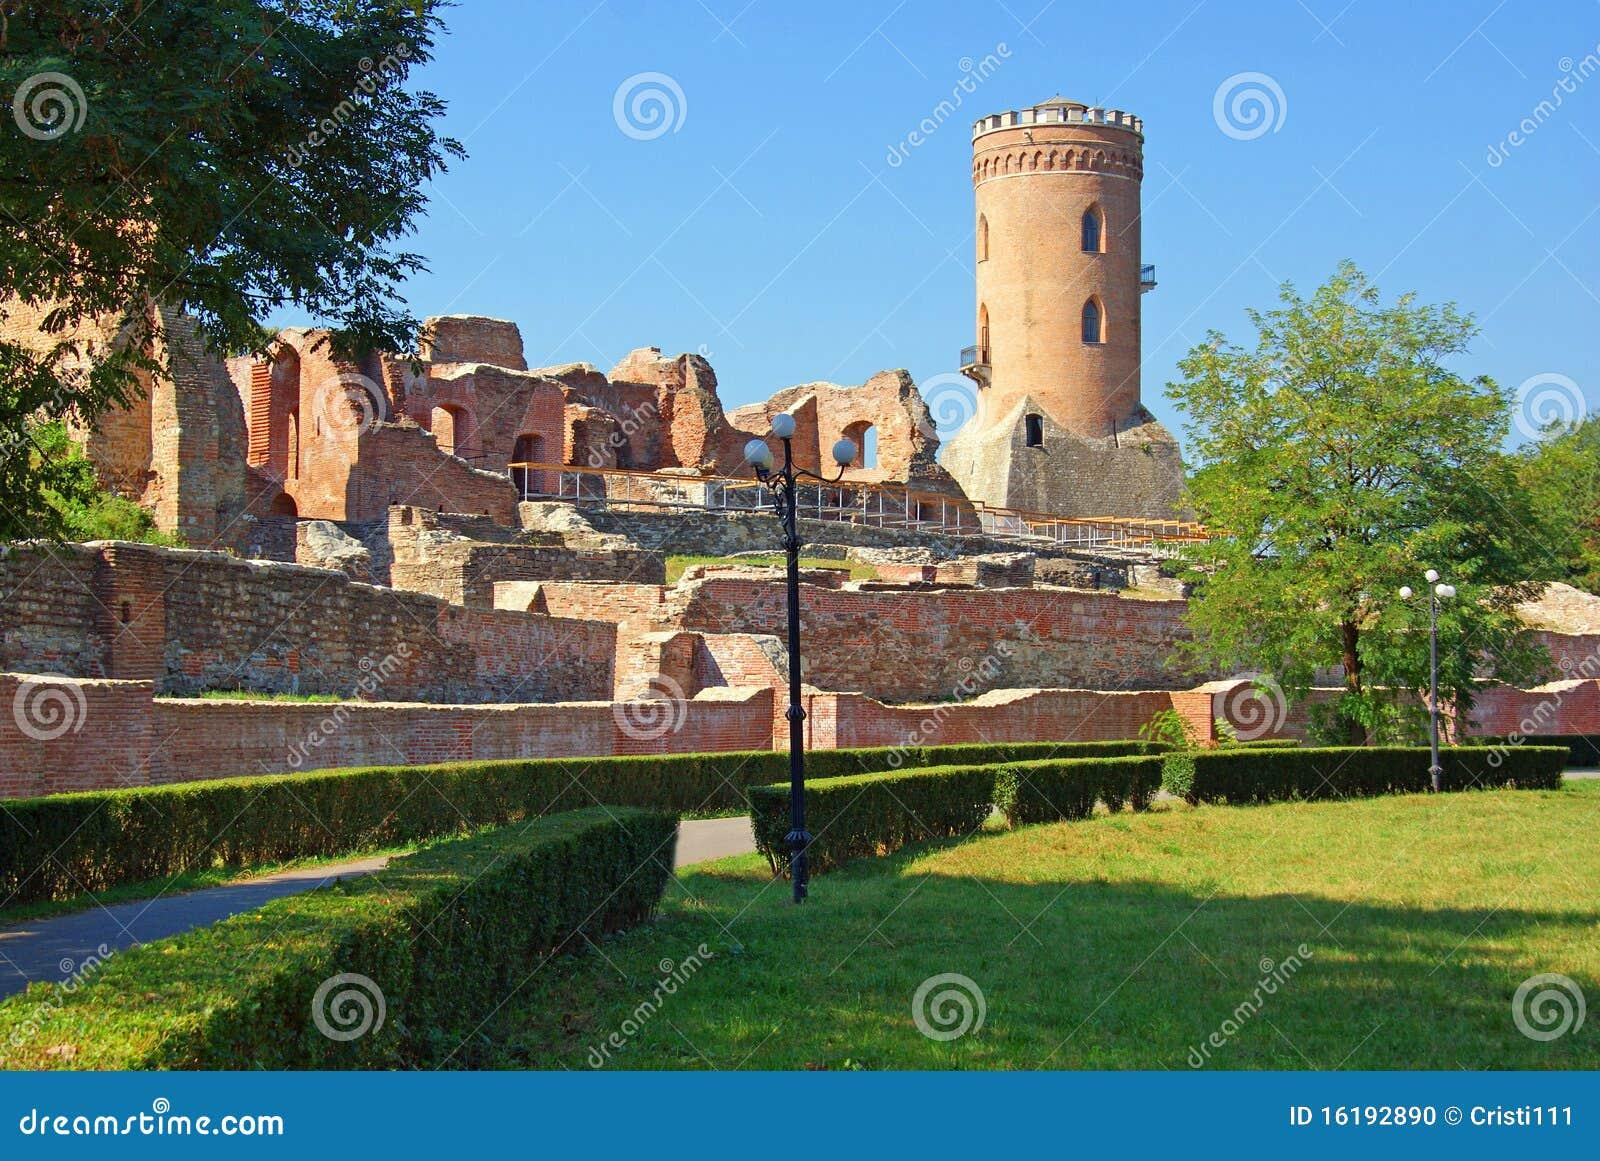 Targoviste: Chindia Tower And Citadel Stock Photo - Image ...